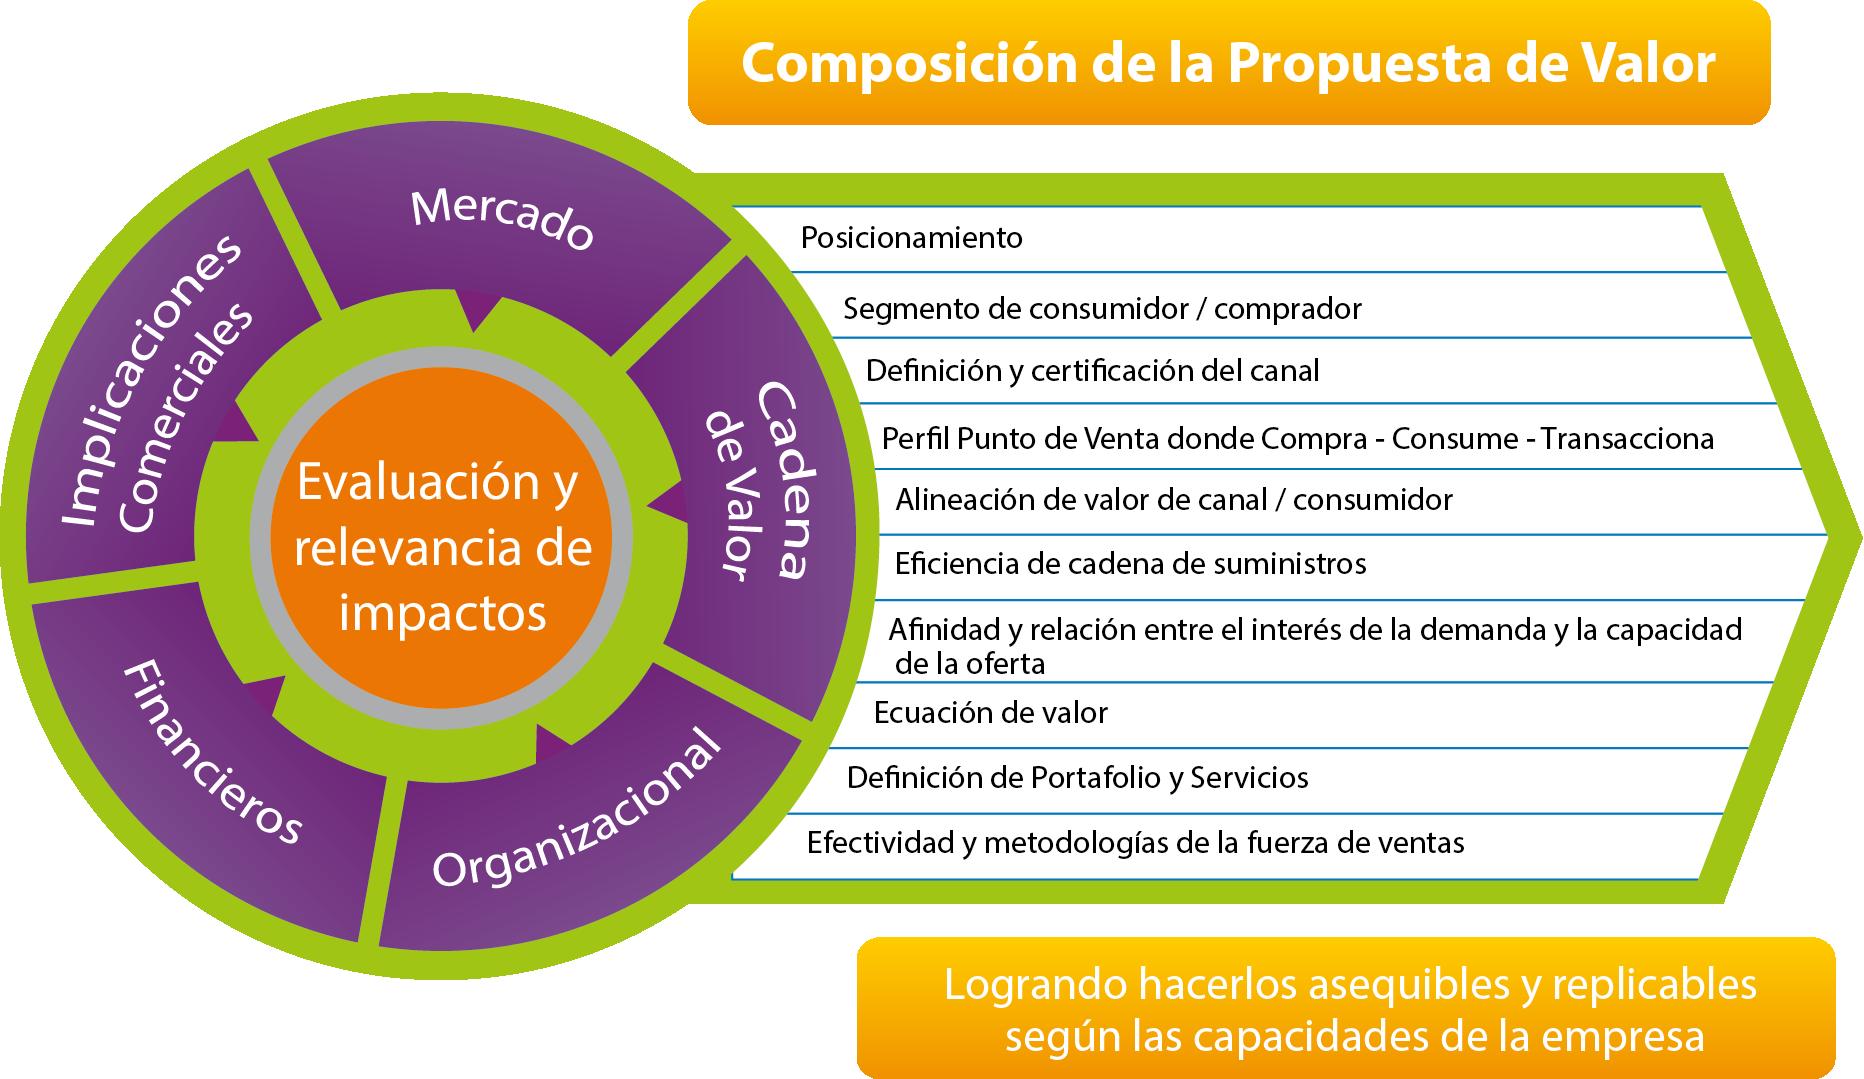 Composisición Propuesta de Valor